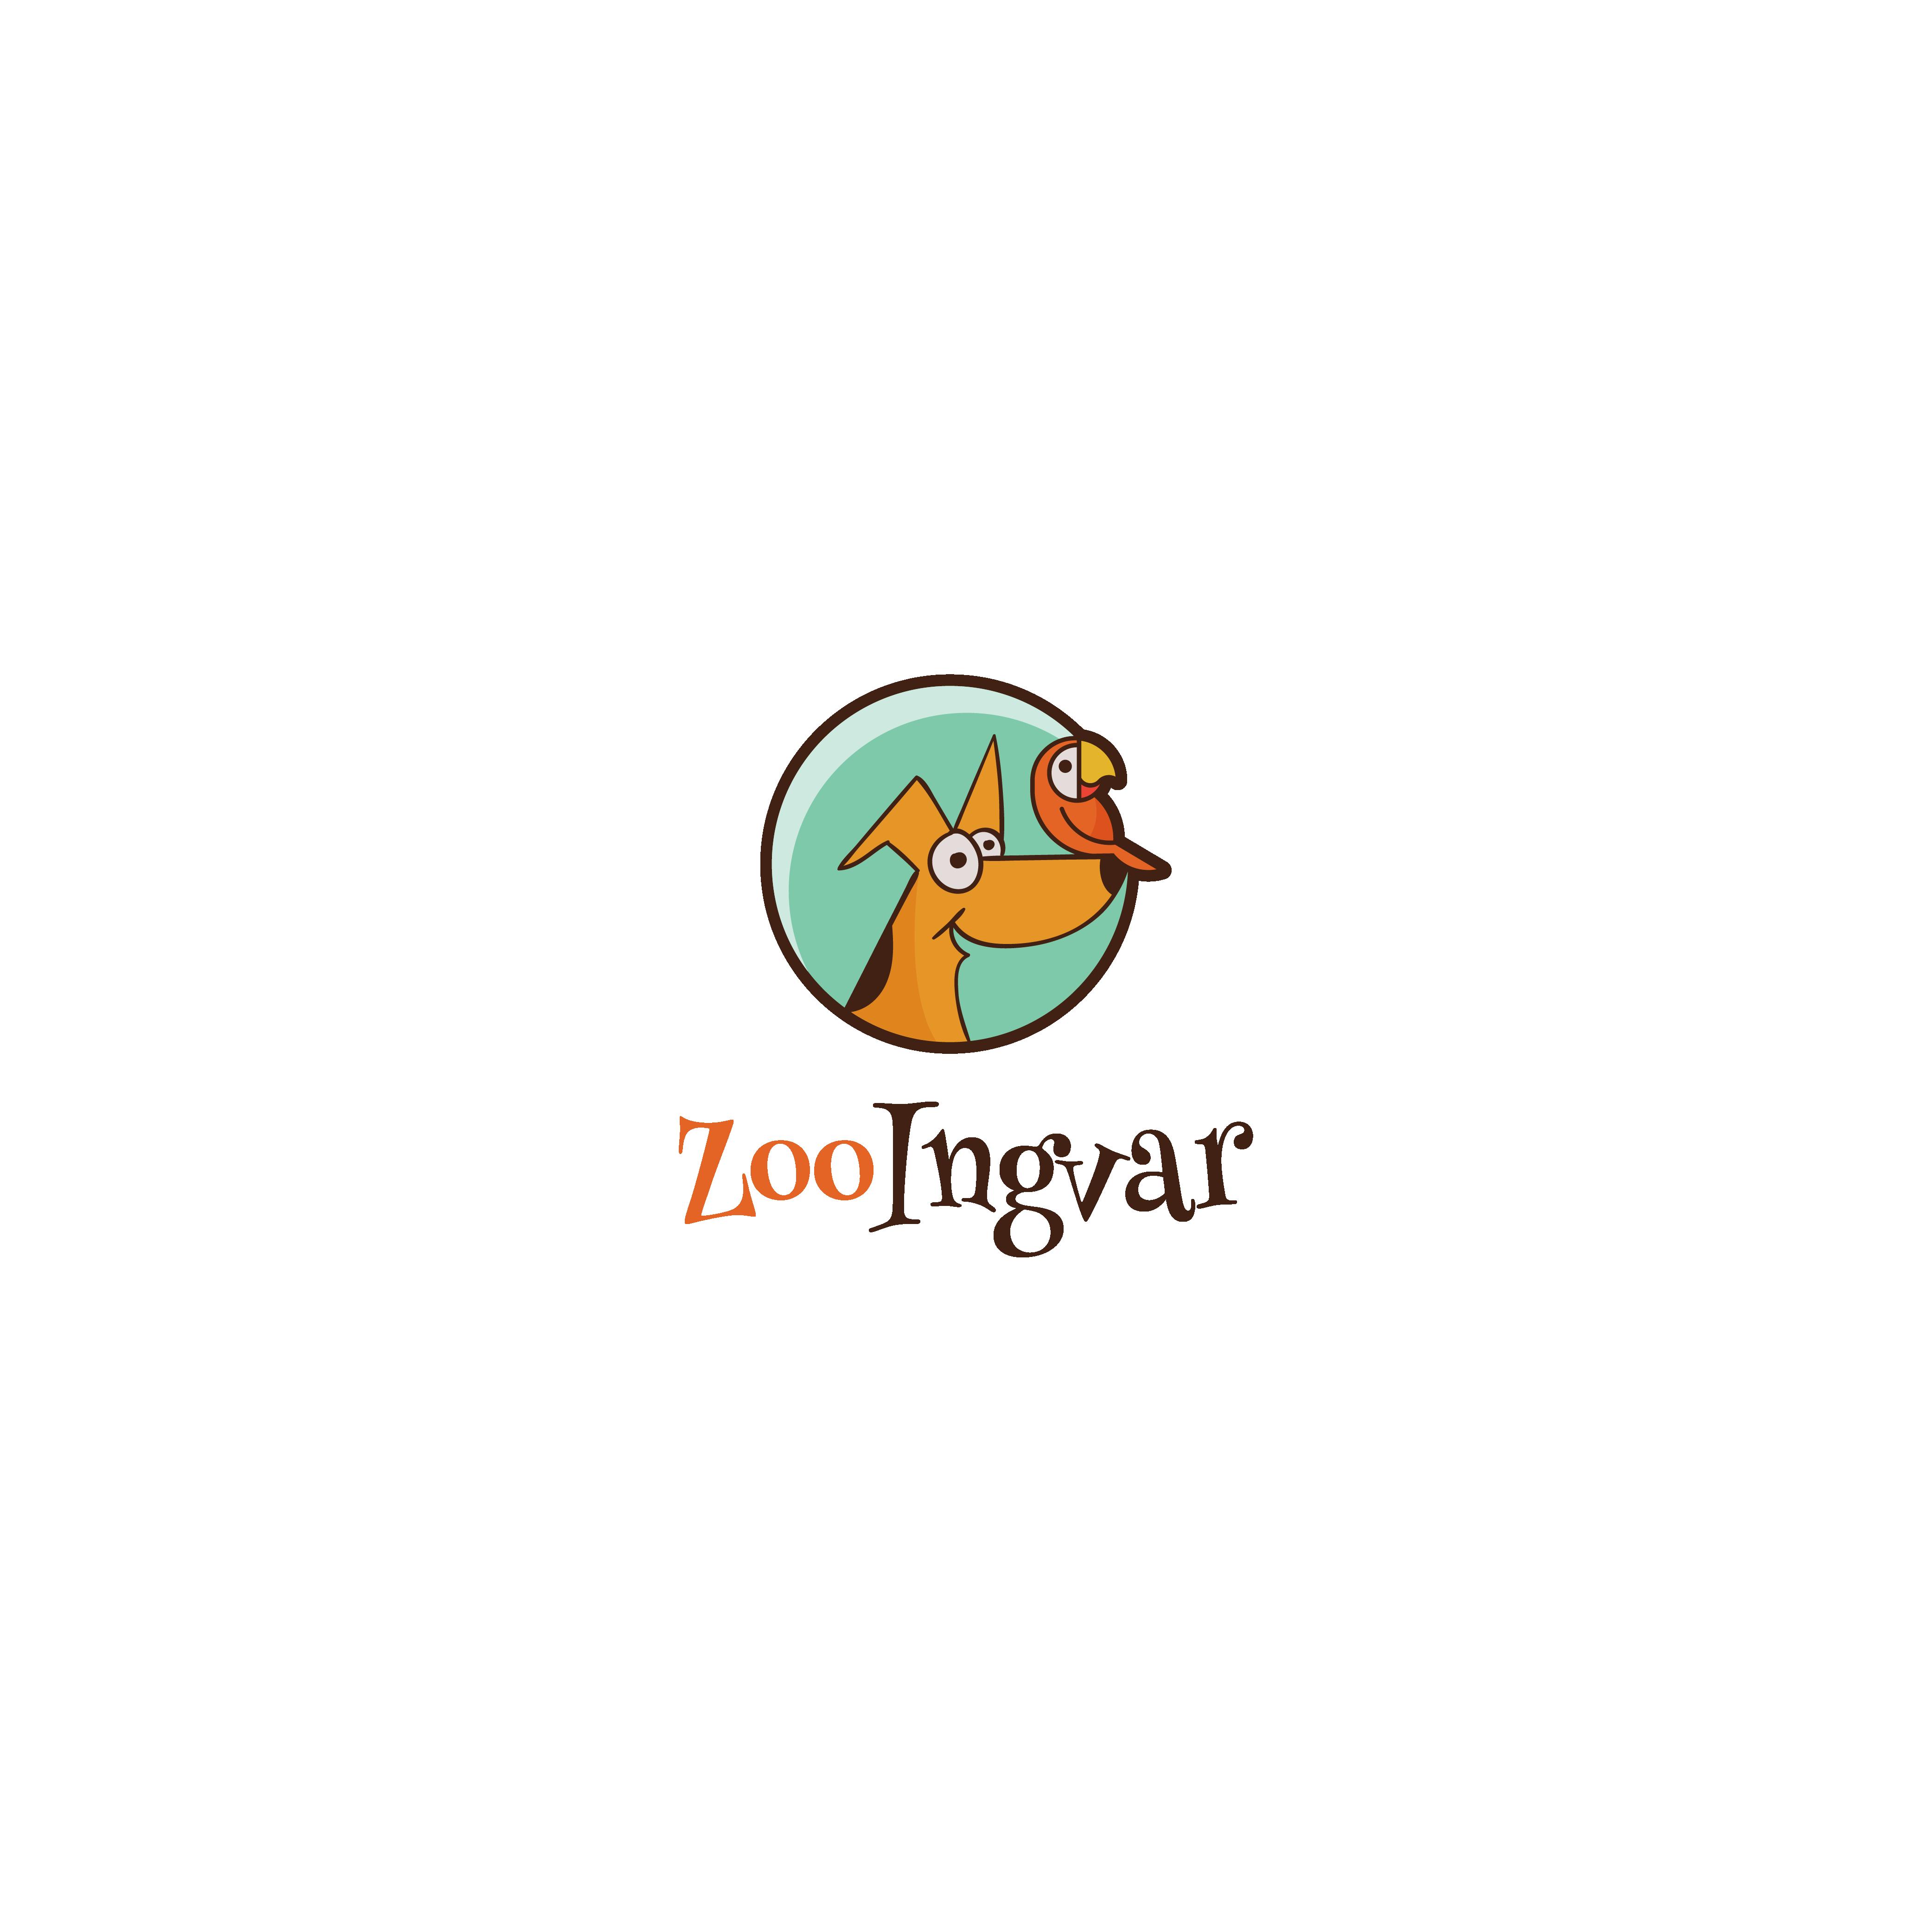 ZooIngvar needs a smashing logo